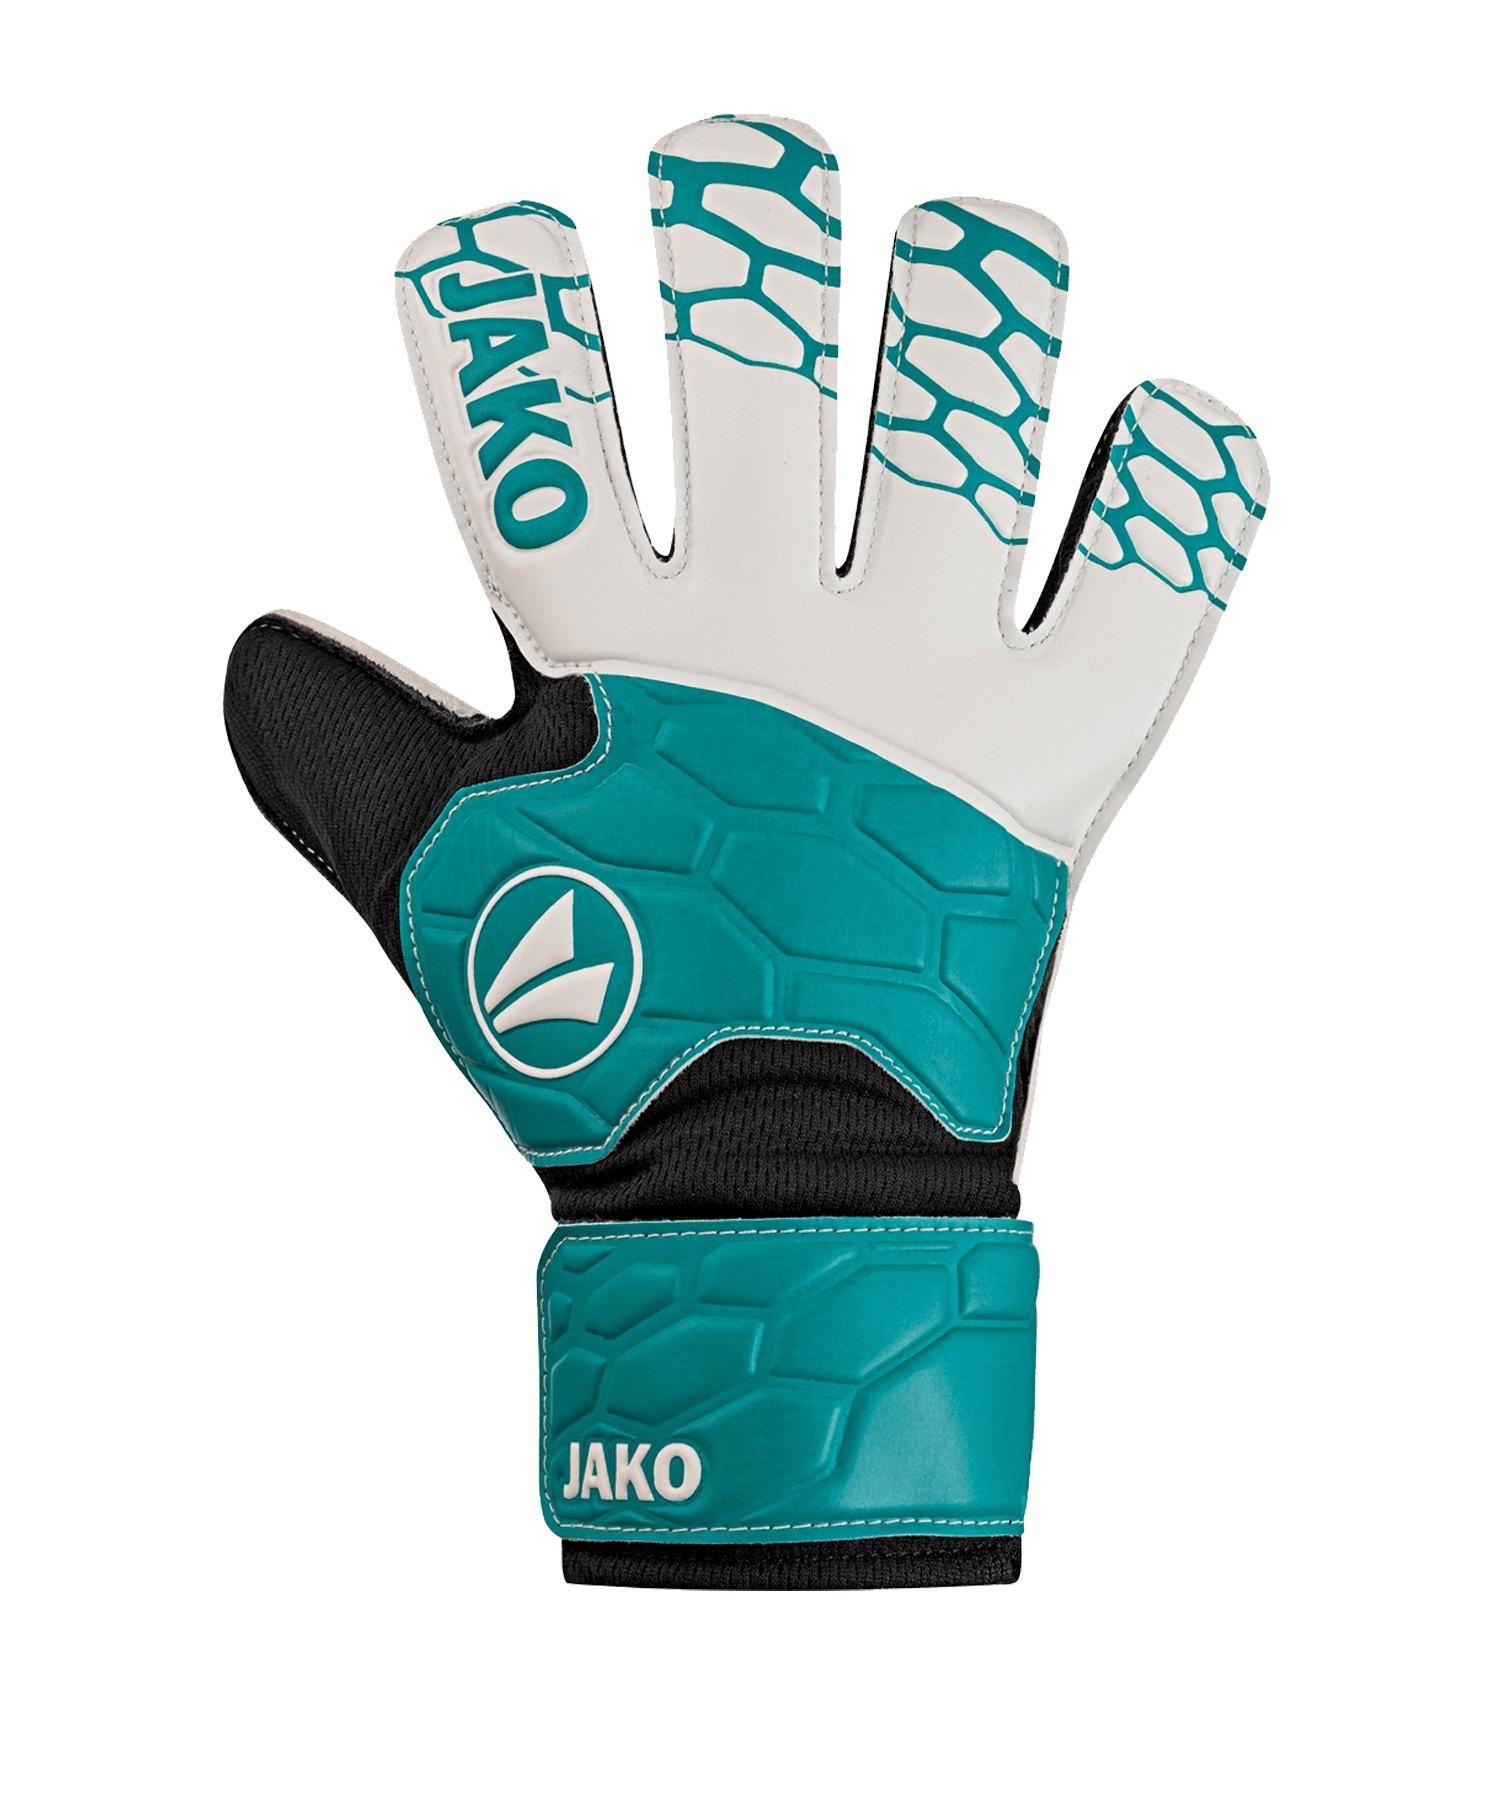 JAKO TW-Handschuh Prestige Basic RC Kids F24 - blau